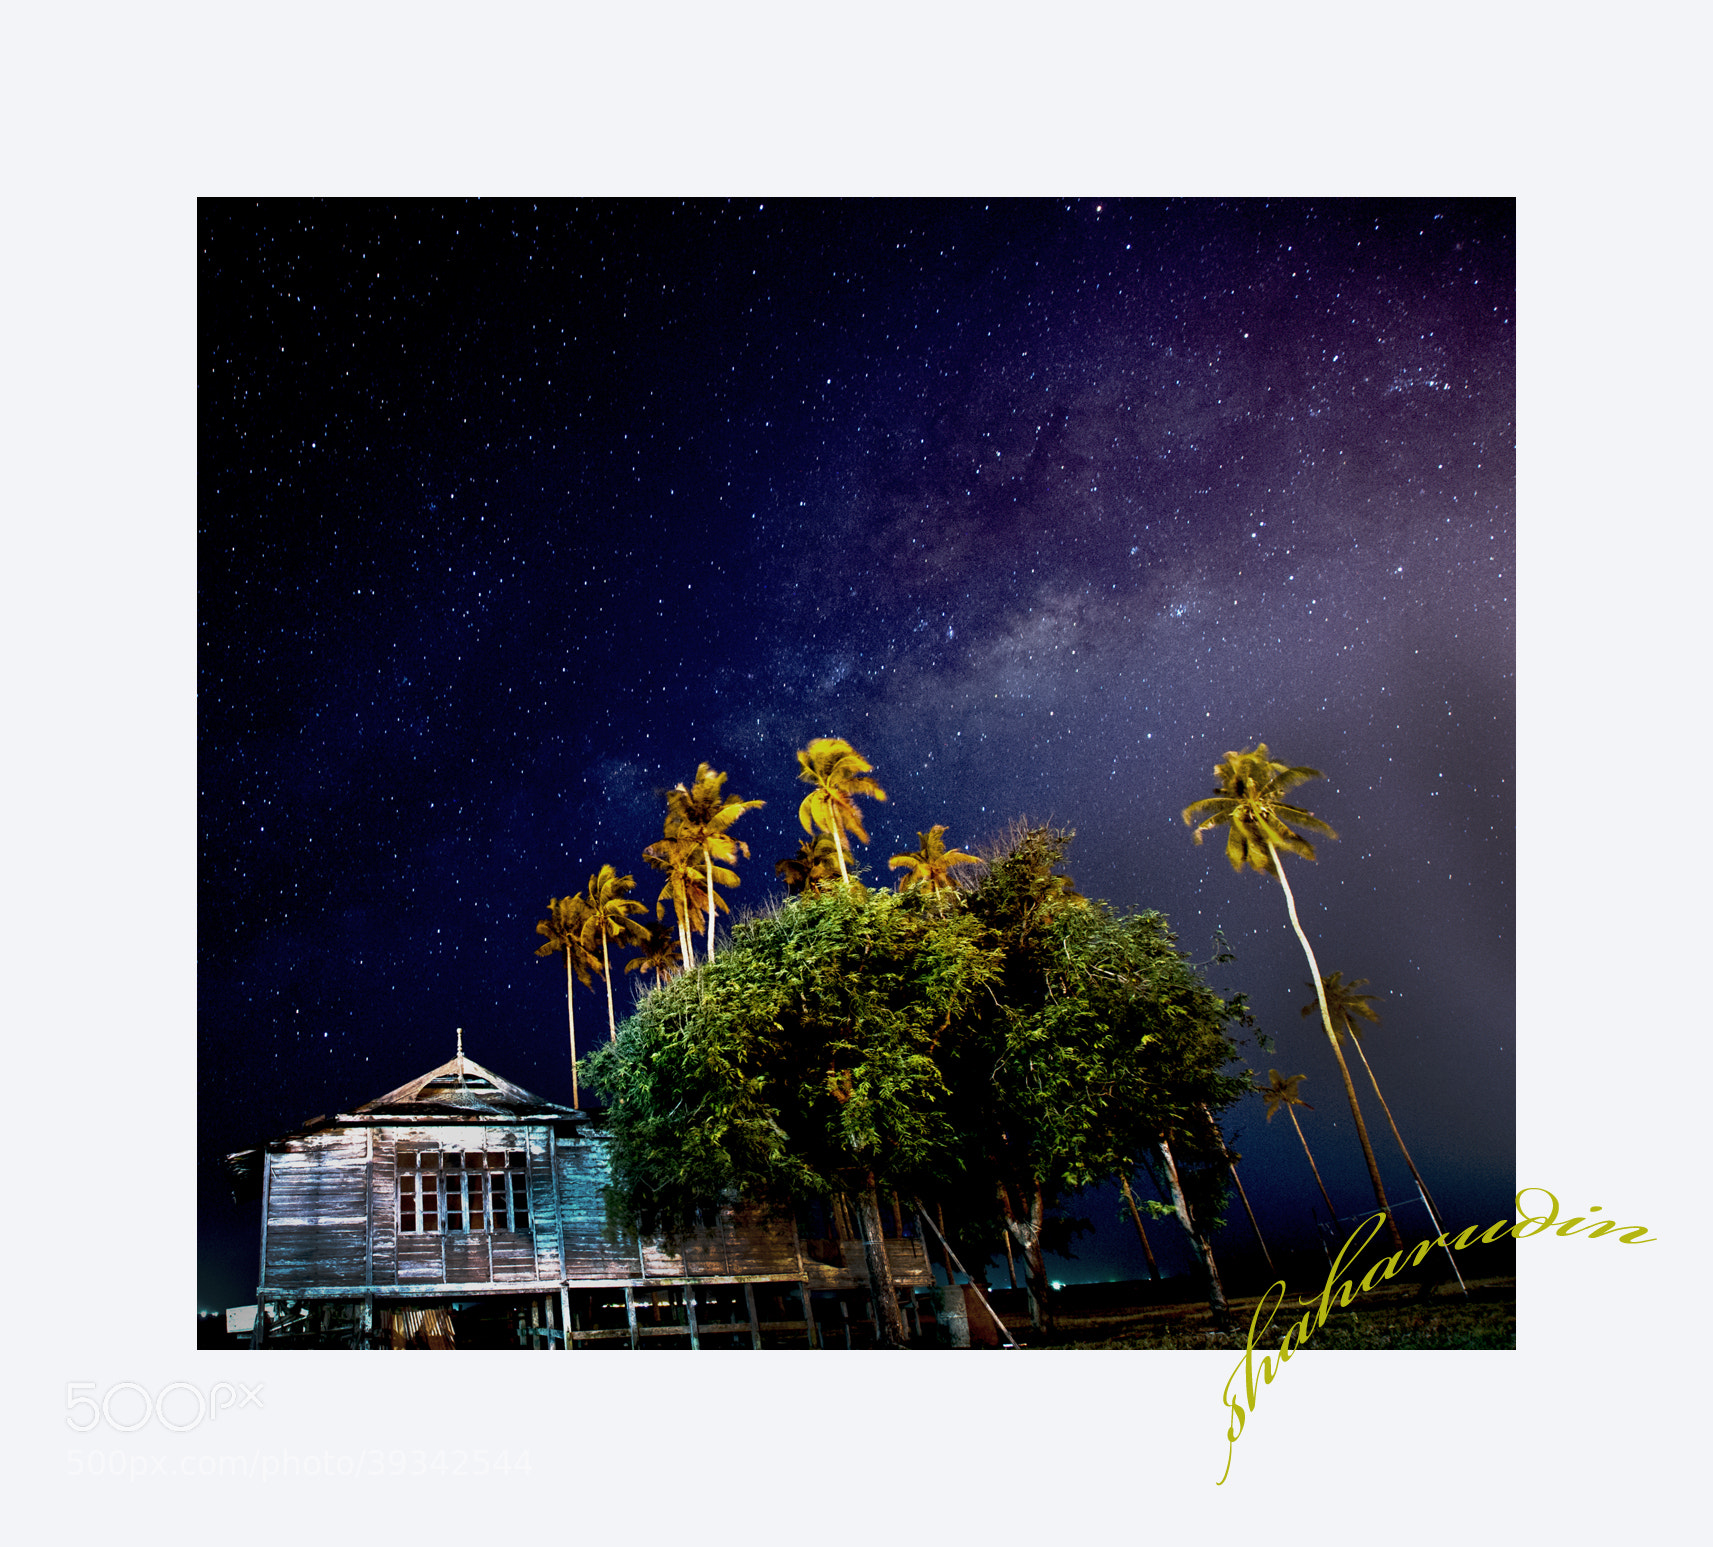 Photograph Milky Way by Shaharudin Abdullah on 500px